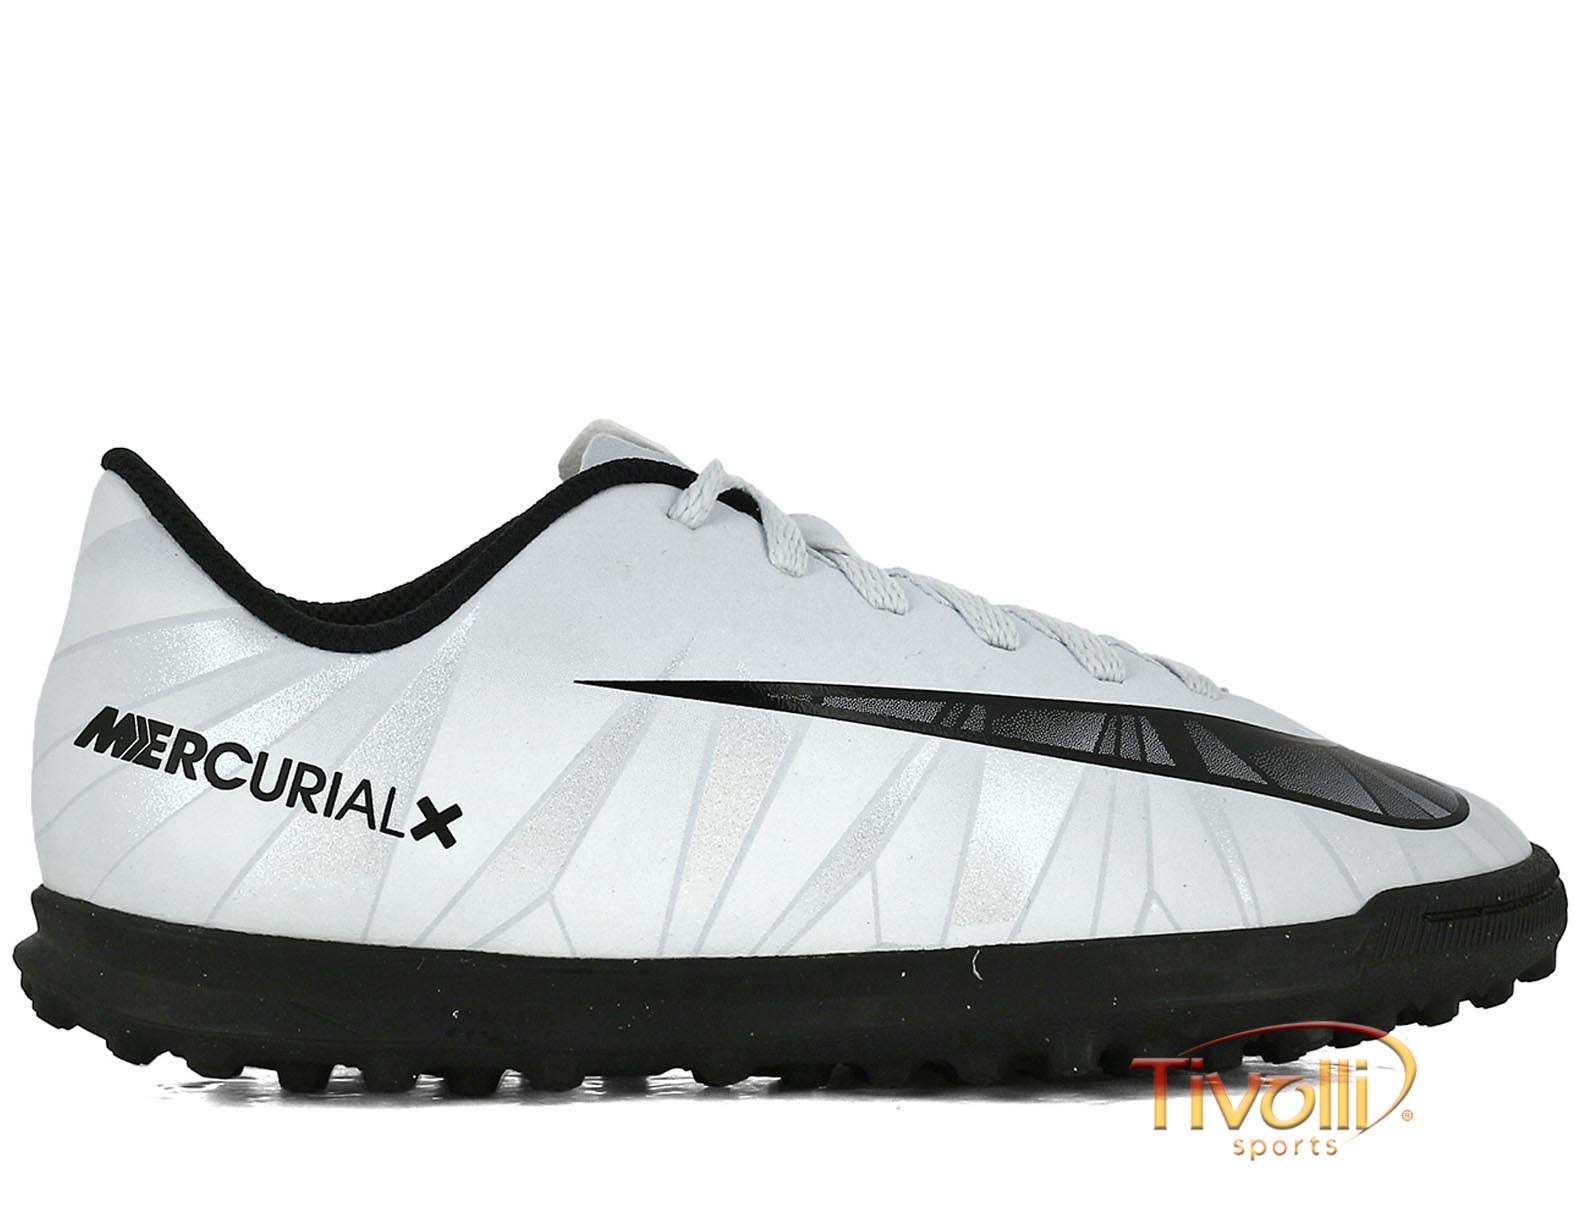 c30d8588f3 Chuteira Nike JR. MercurialX Vortex III CR7 TF Society Infantil - Mega  Saldão